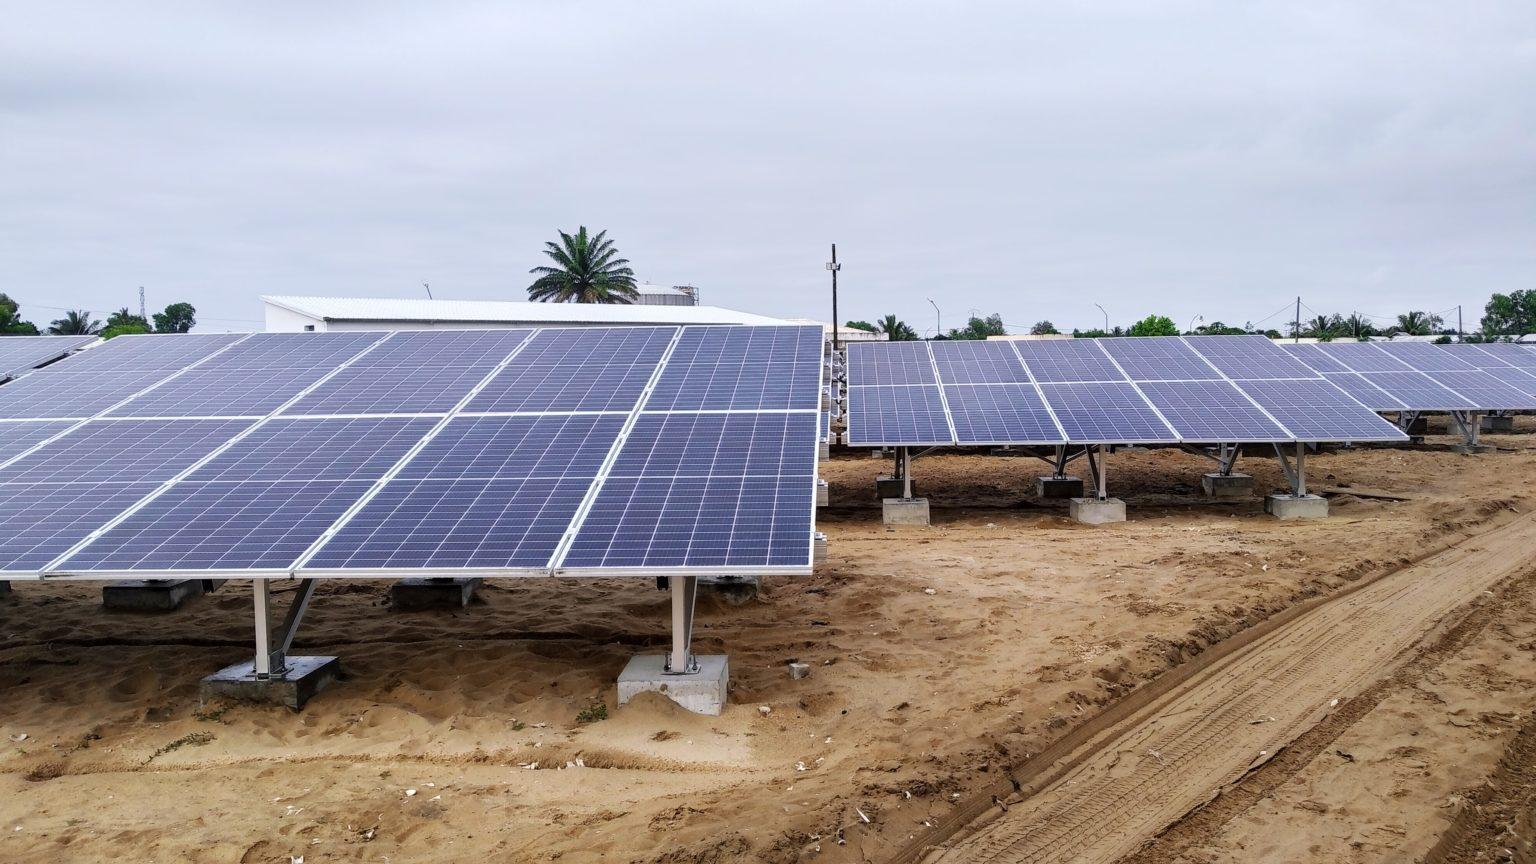 madagascar-groupe-filiale-solar-farm-1536x864-2